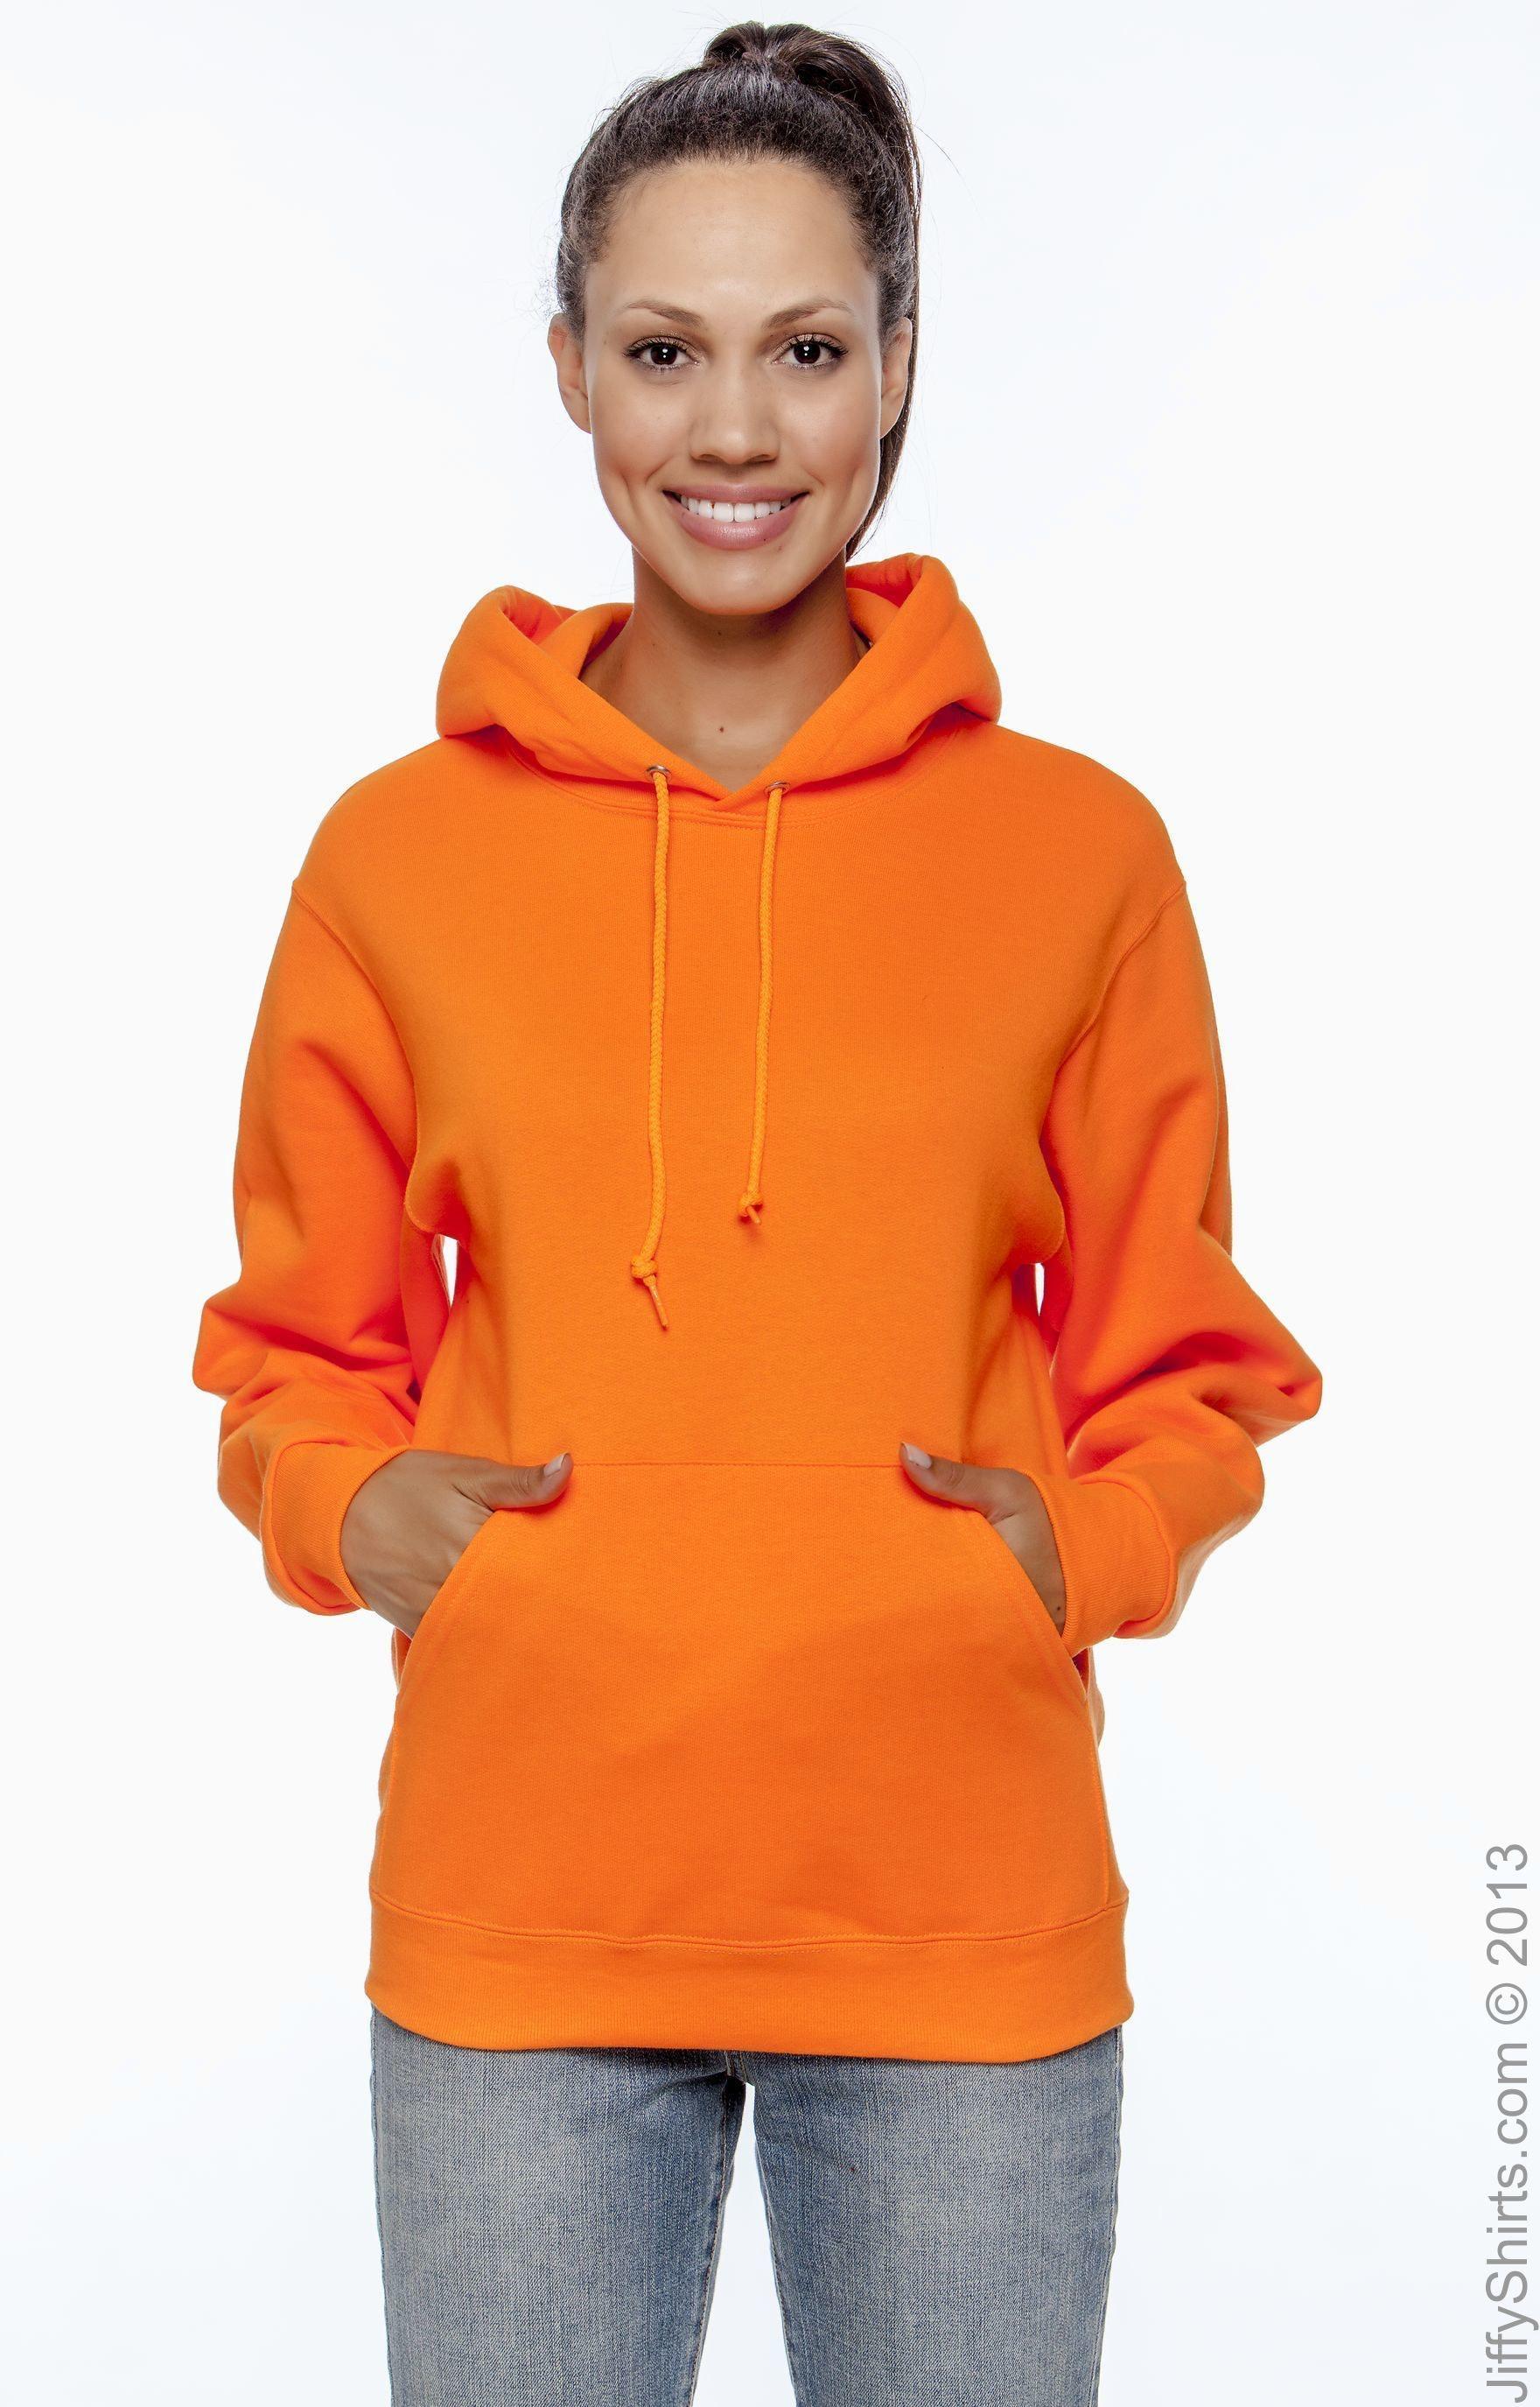 Jerzees 996 High Viz Safety Orange